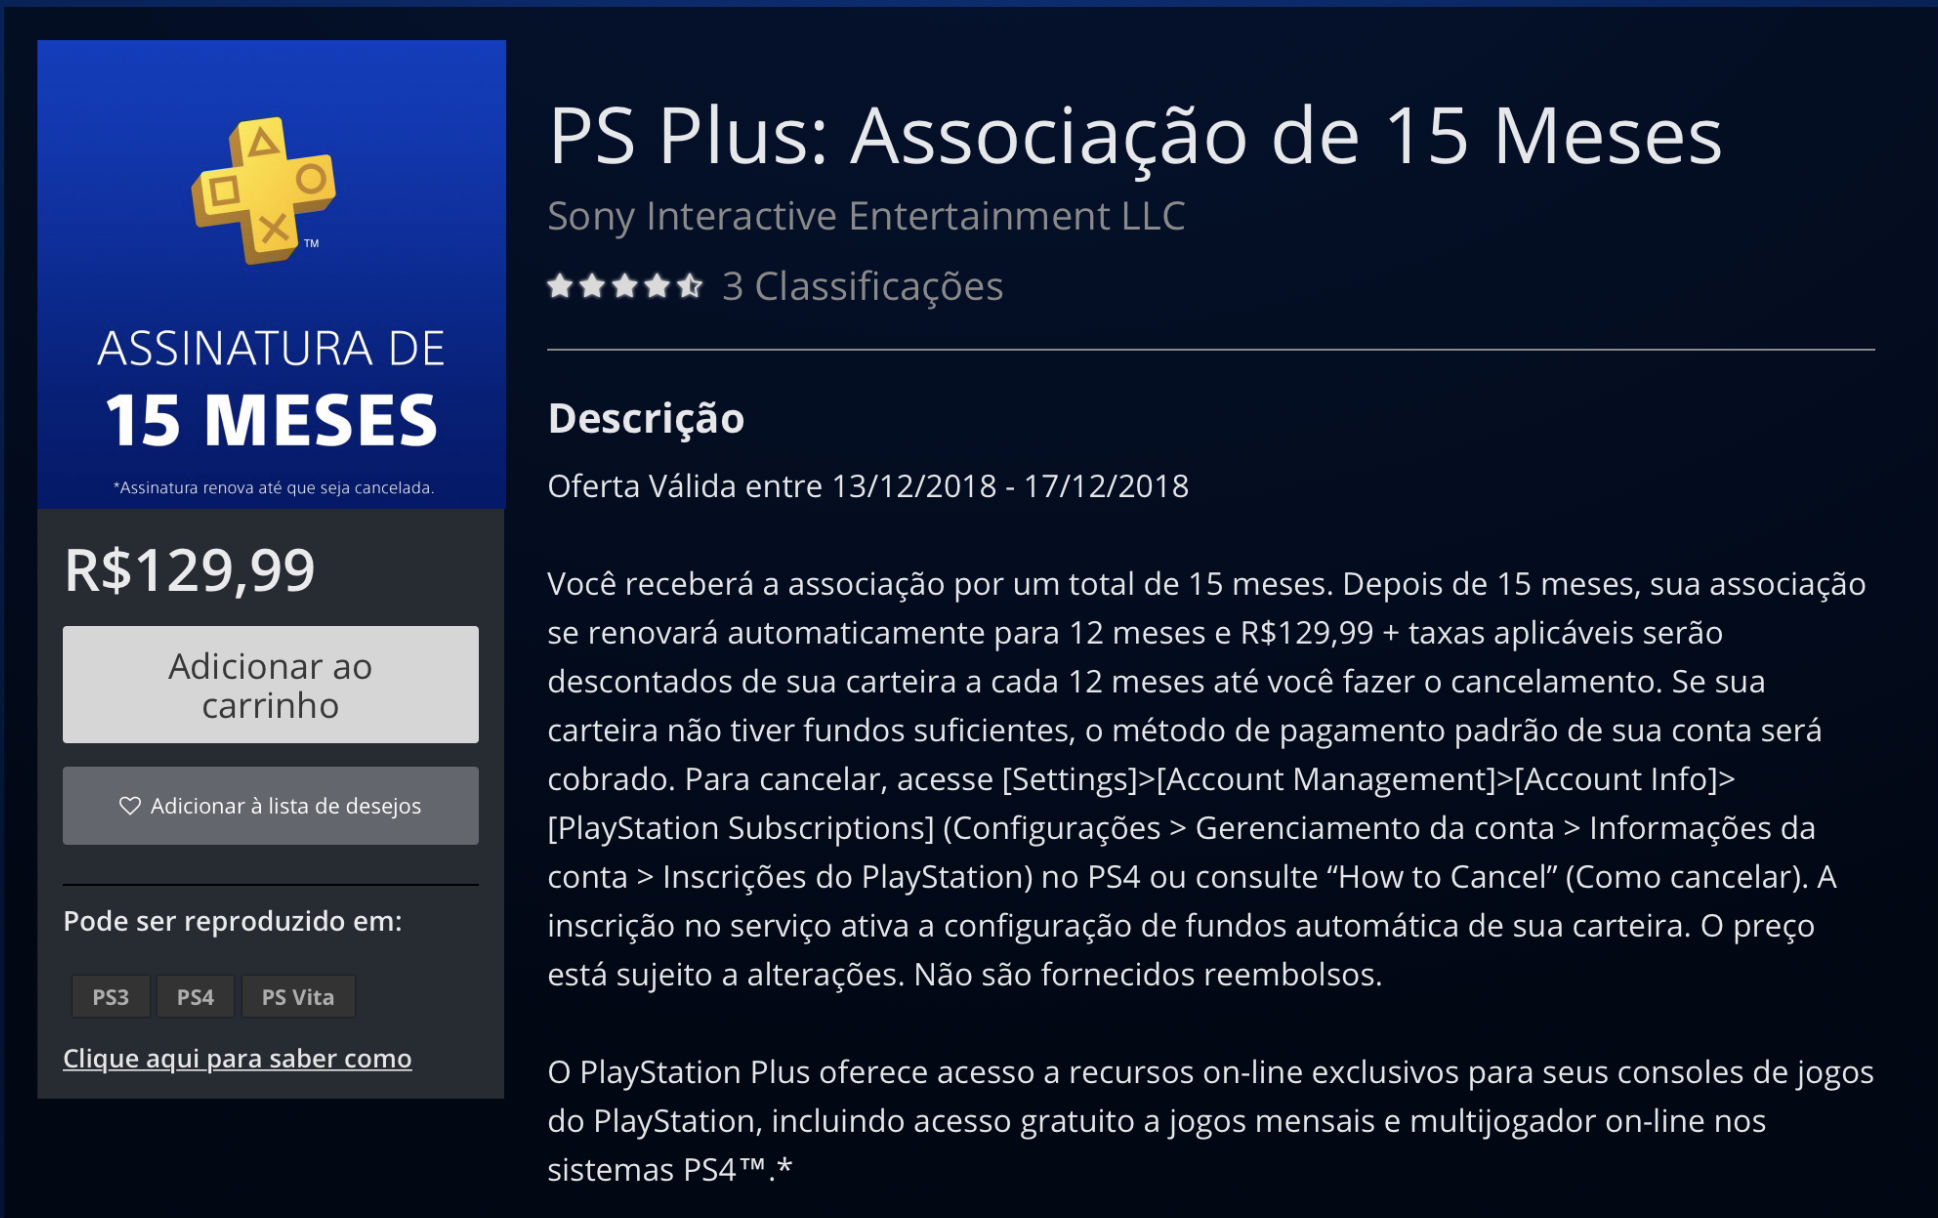 PS Plus 15 meses